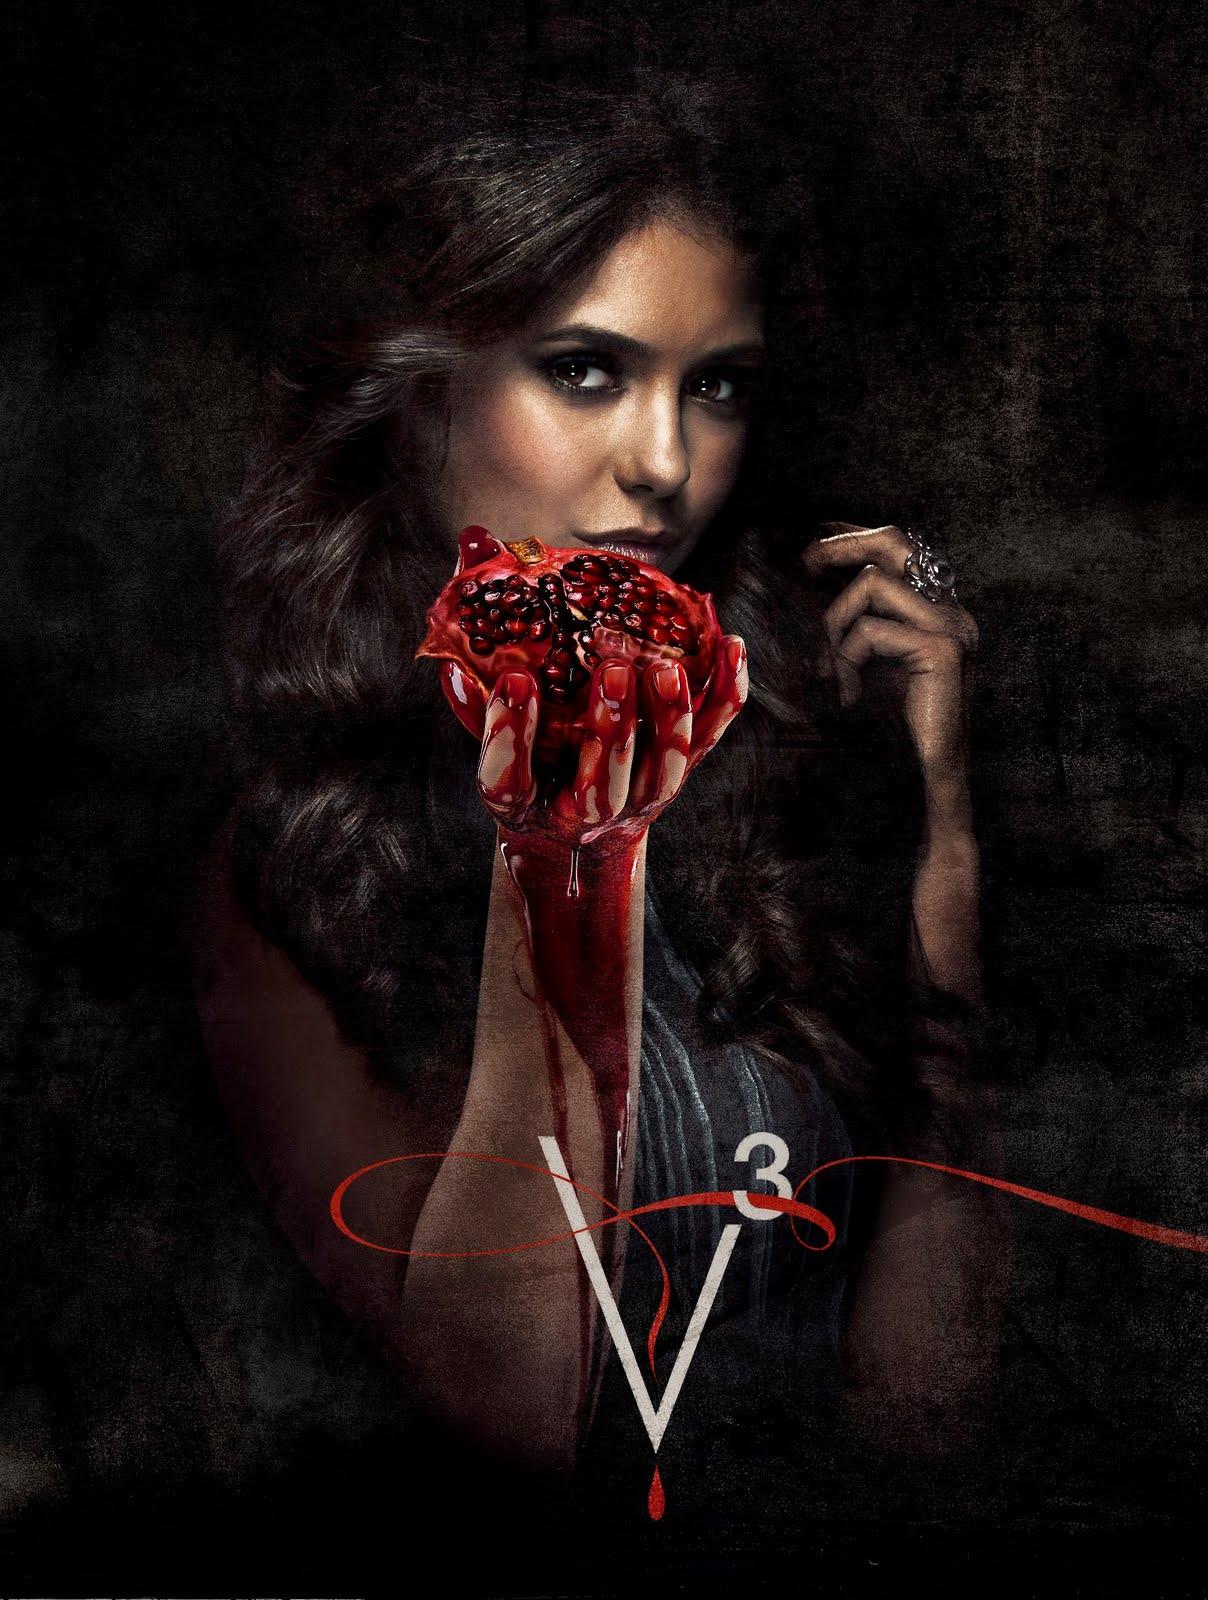 http://4.bp.blogspot.com/-bSROztn3DLM/Tm7esGq8uGI/AAAAAAAABQA/m6-bR2Lktis/s1600/the+vampire+diaries+season+3-+nina+dobrev.jpg